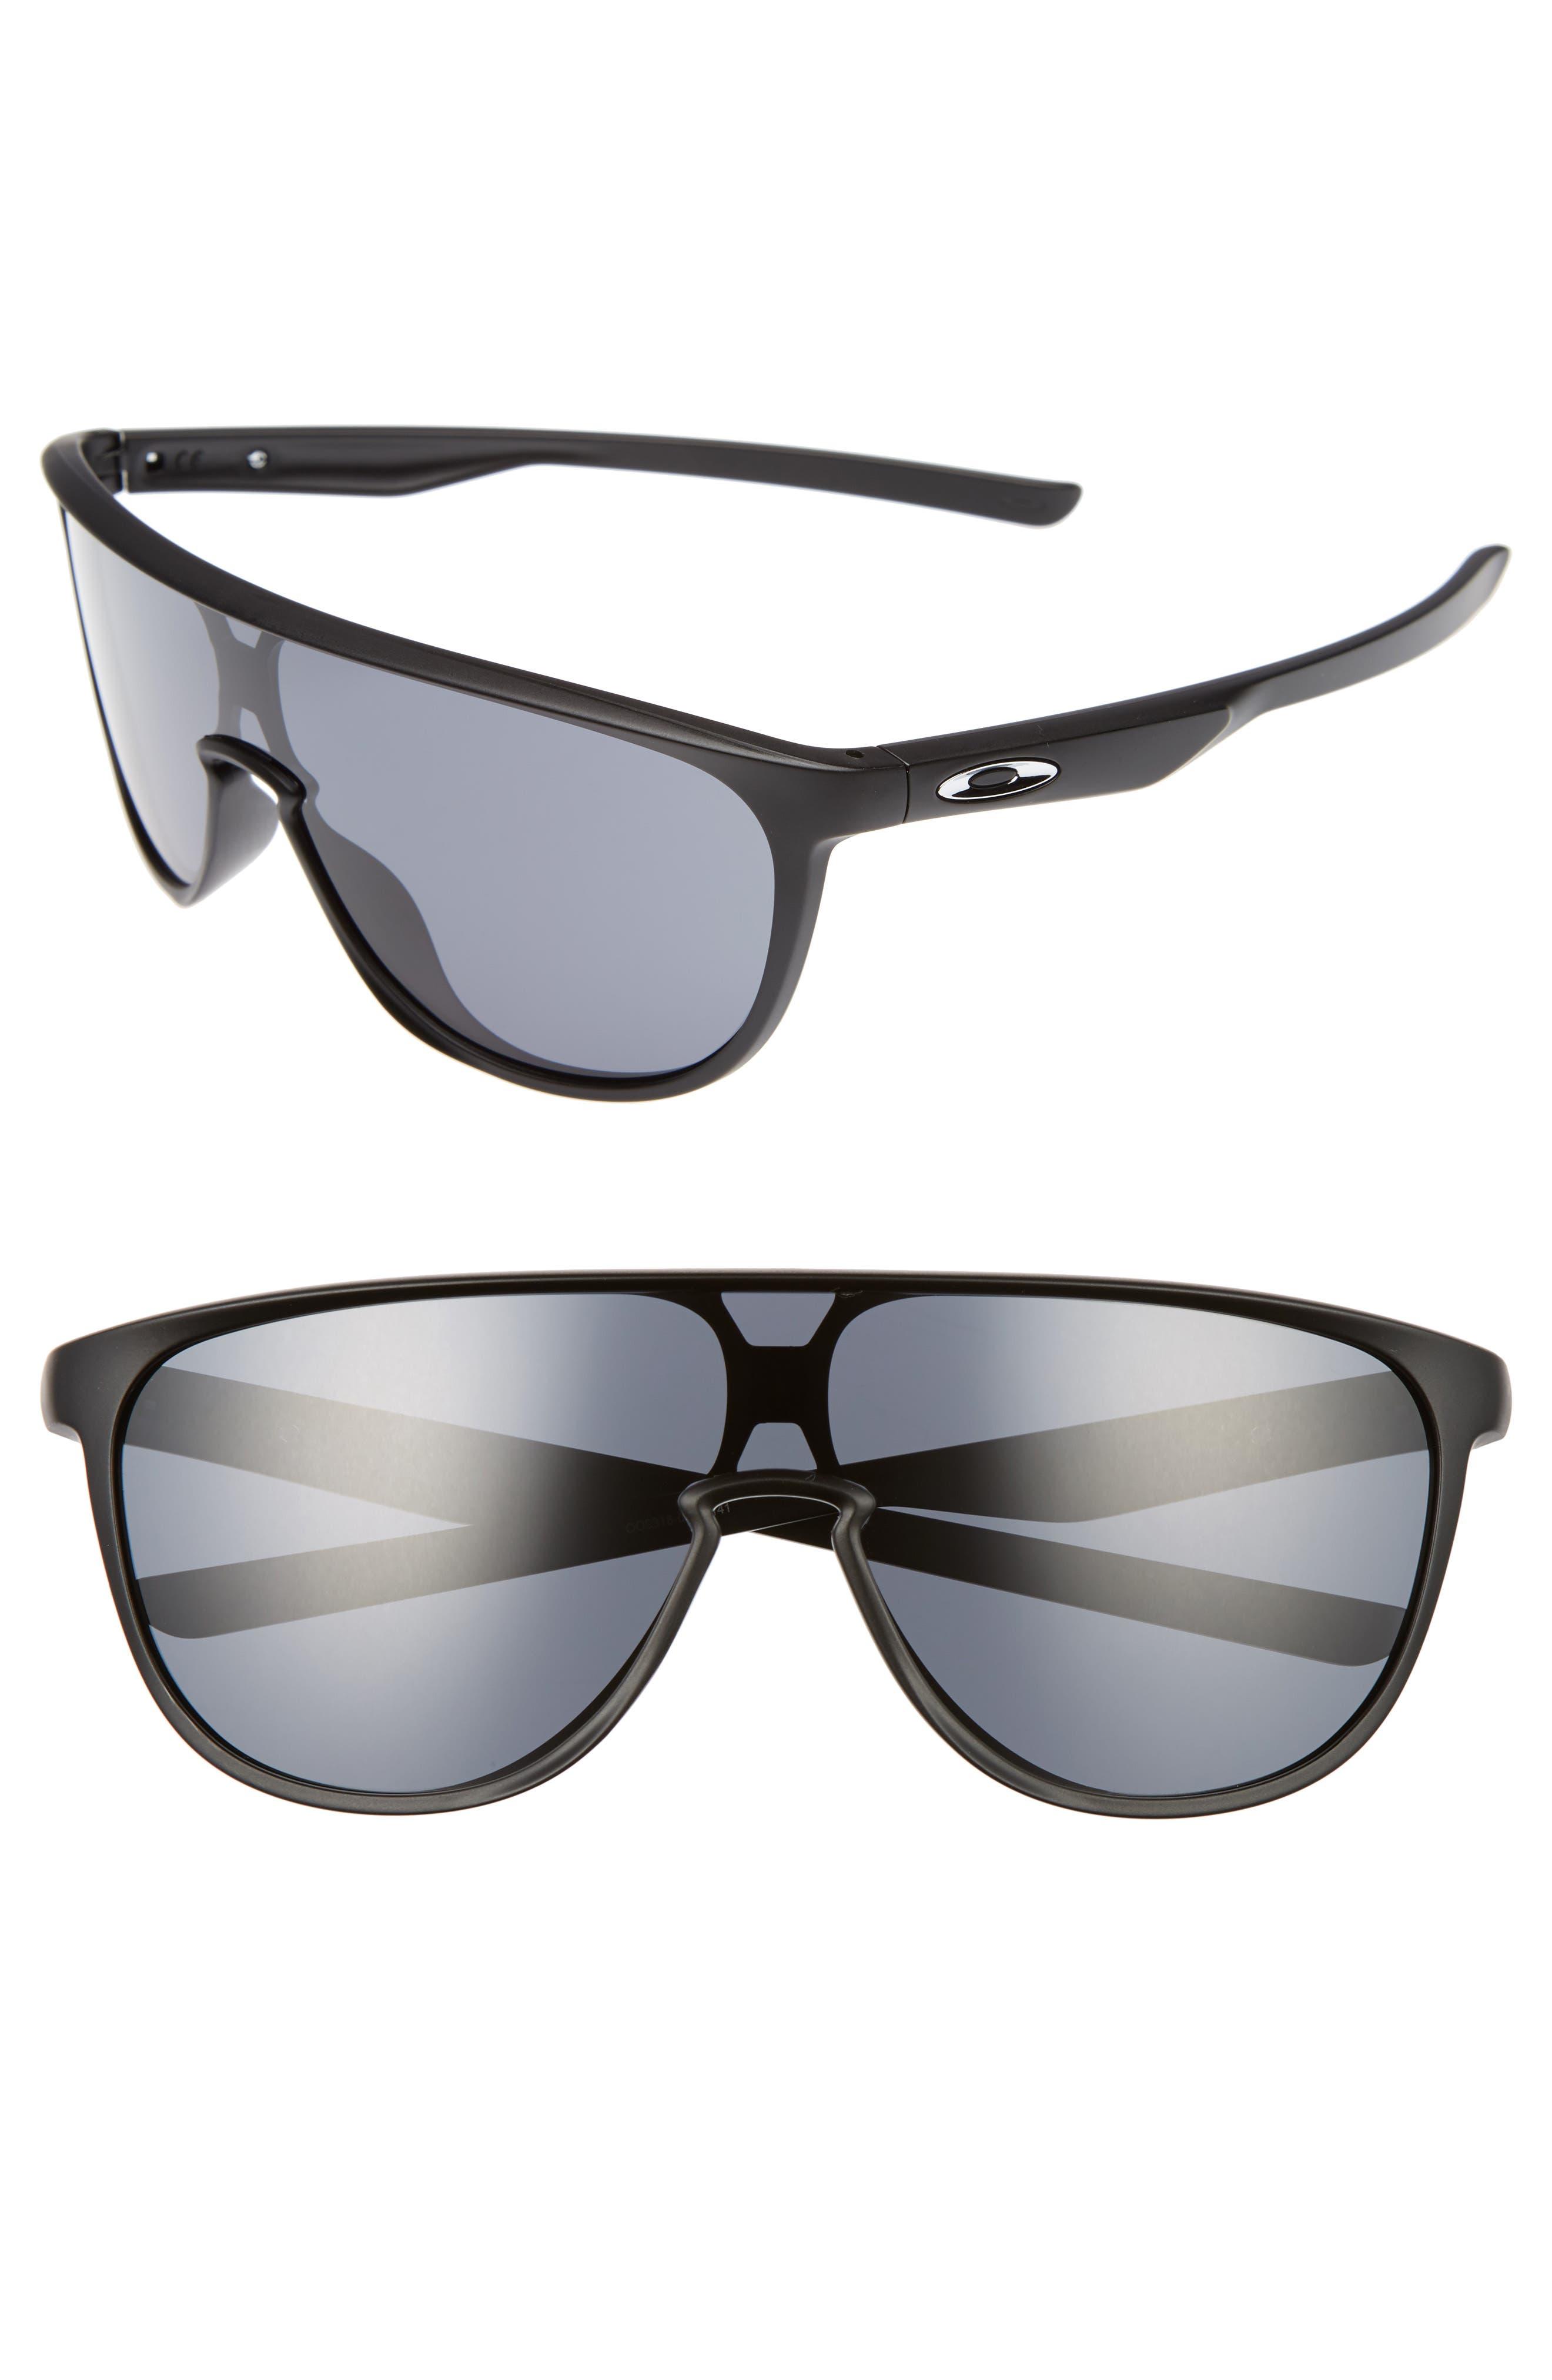 Trillbe 140mm Shield Sunglasses,                             Main thumbnail 1, color,                             001